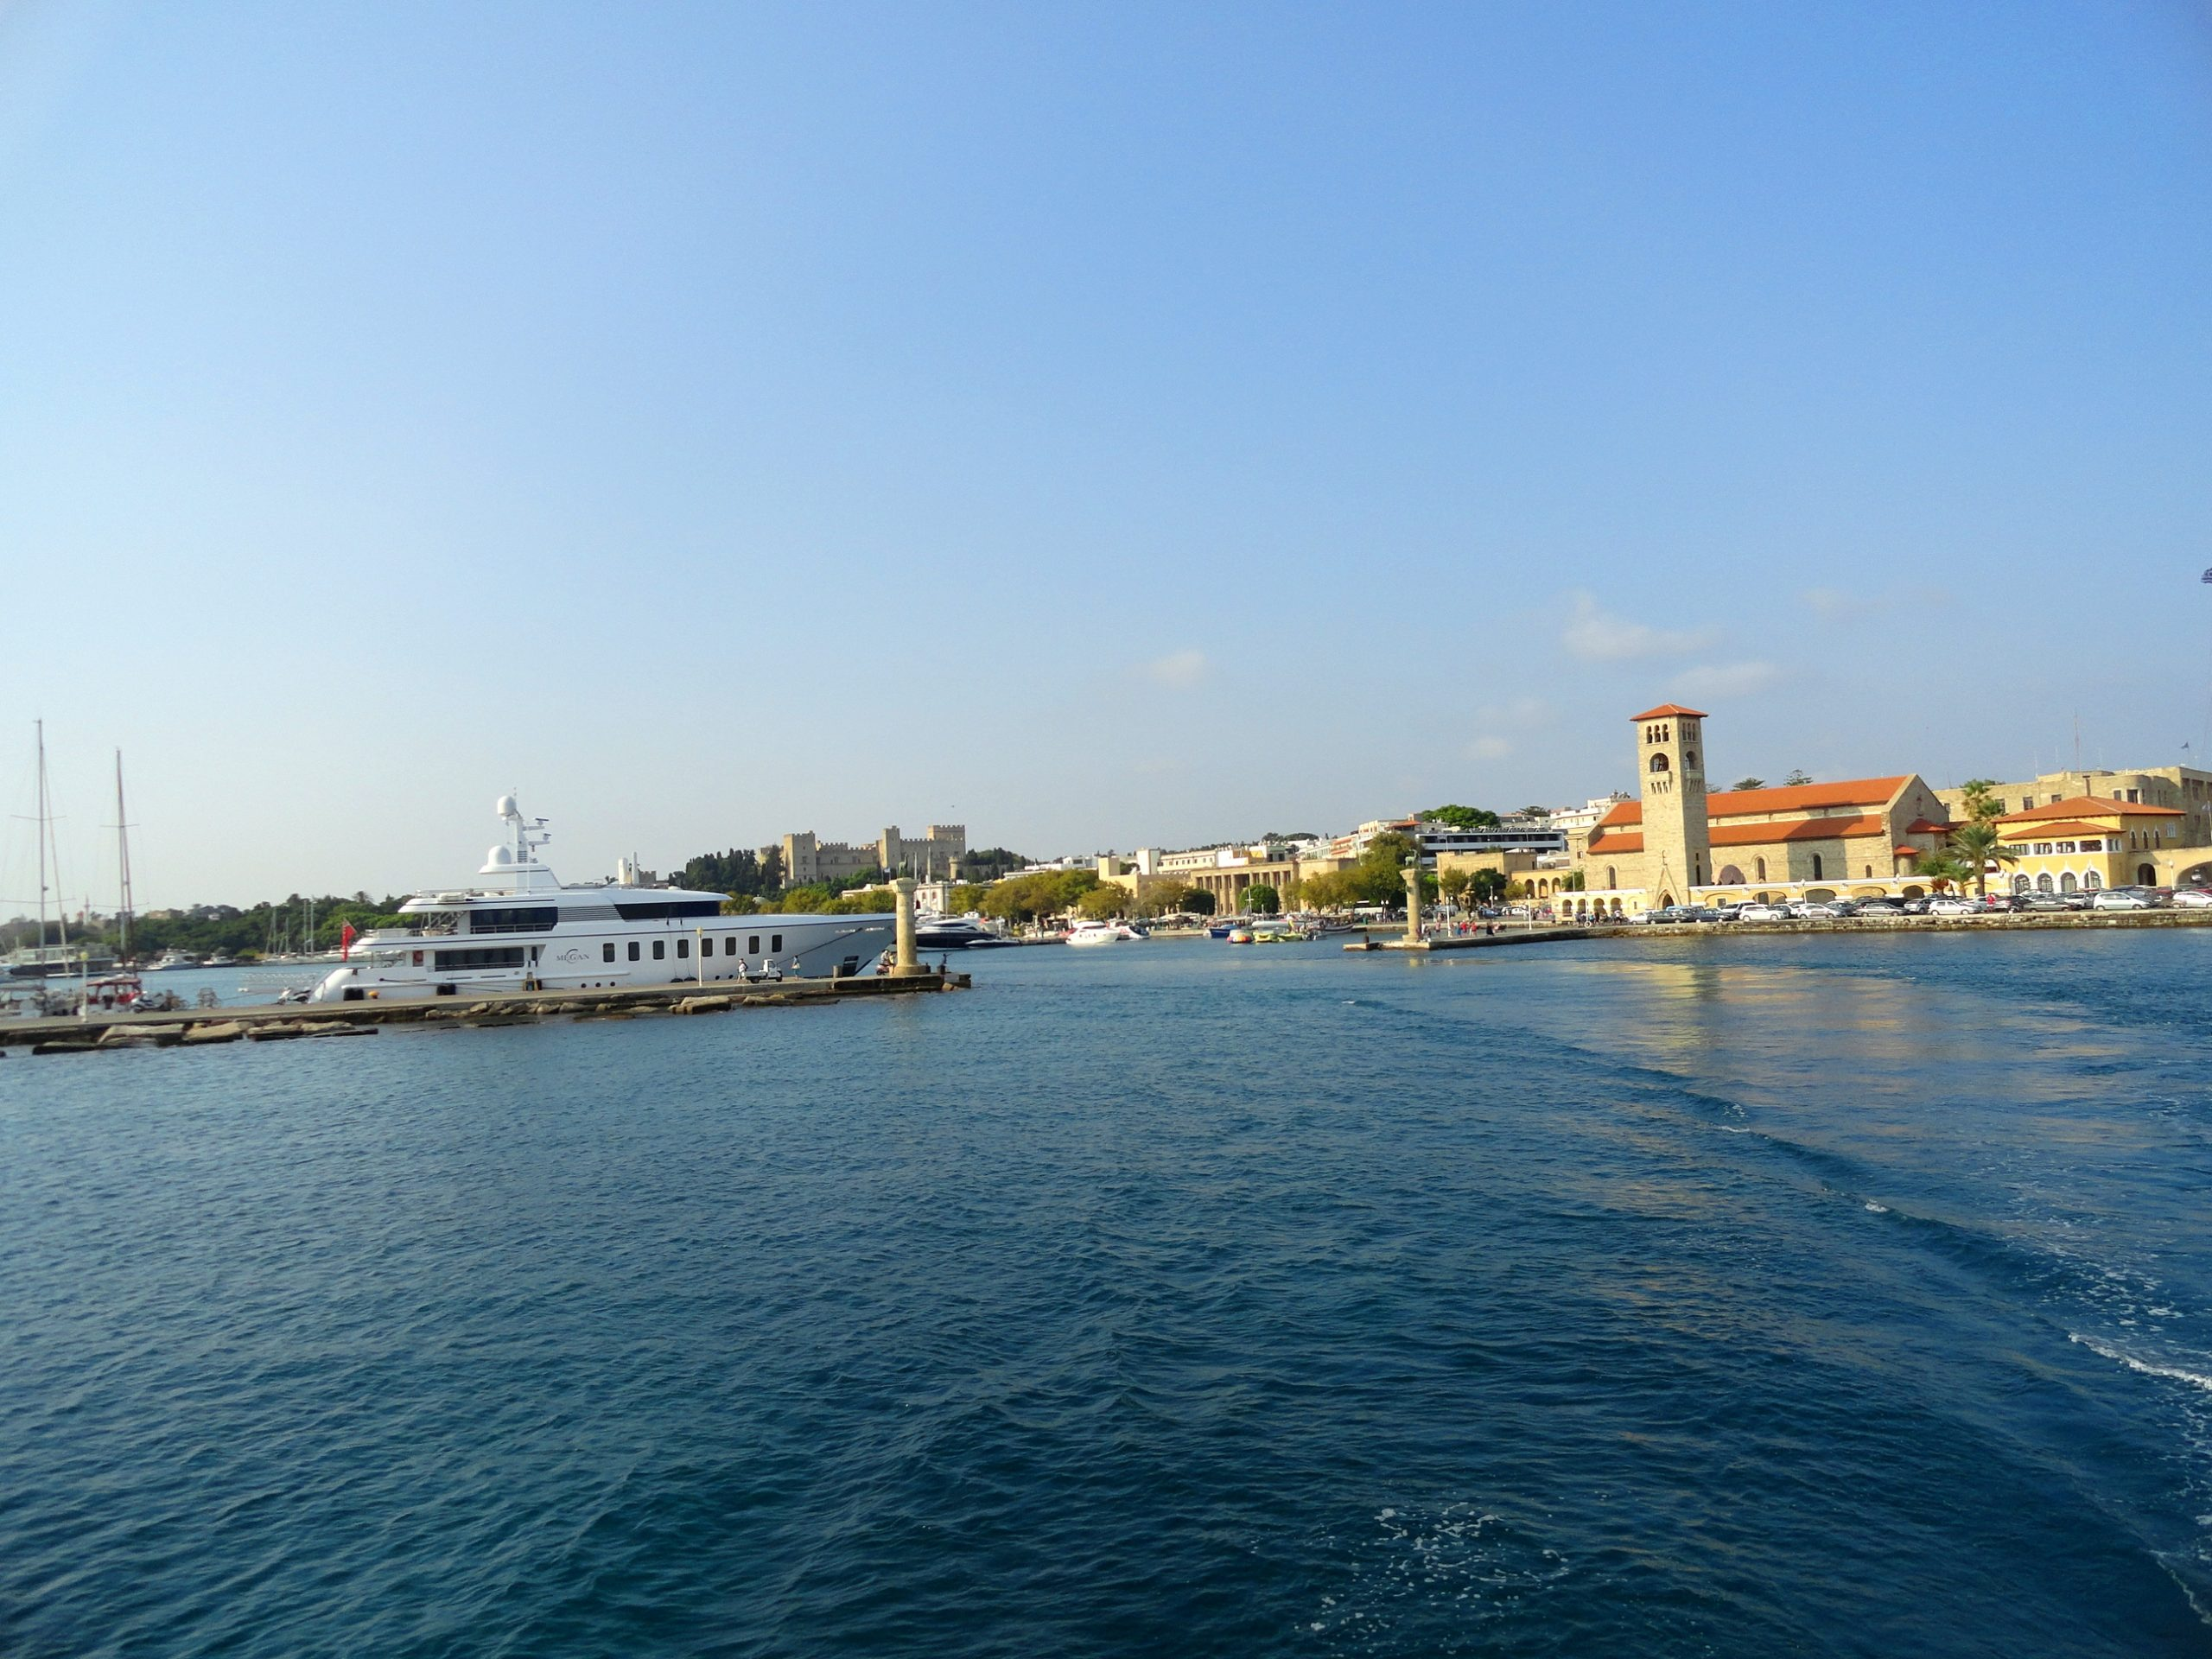 Vacanţa turiştilor în Rodos, foto @ANCAPAVEL.RO